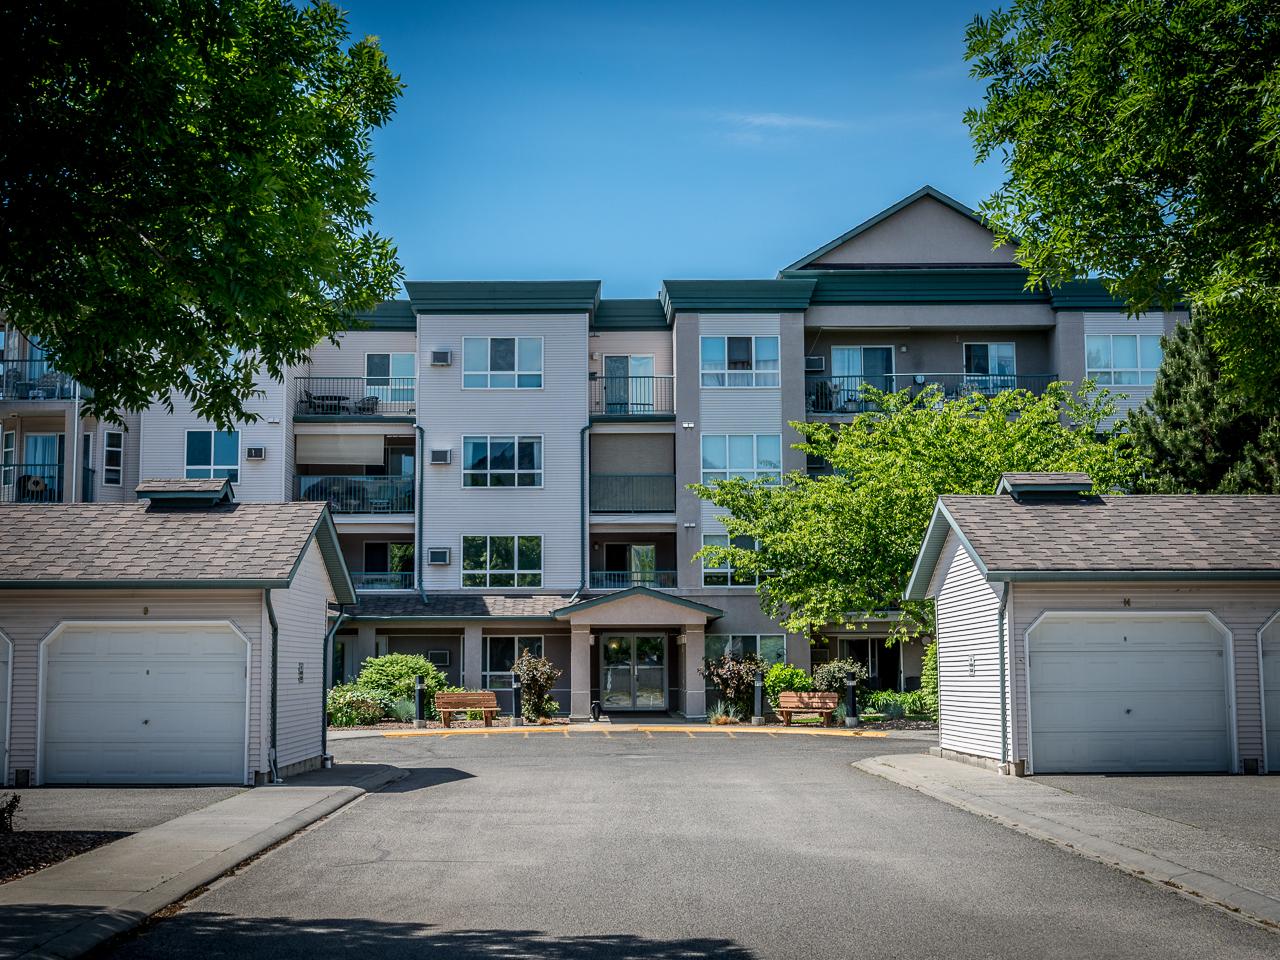 New Listing: 405-860 Nicolani Drive, Brocklehurst, Kamloops, BC $224,900